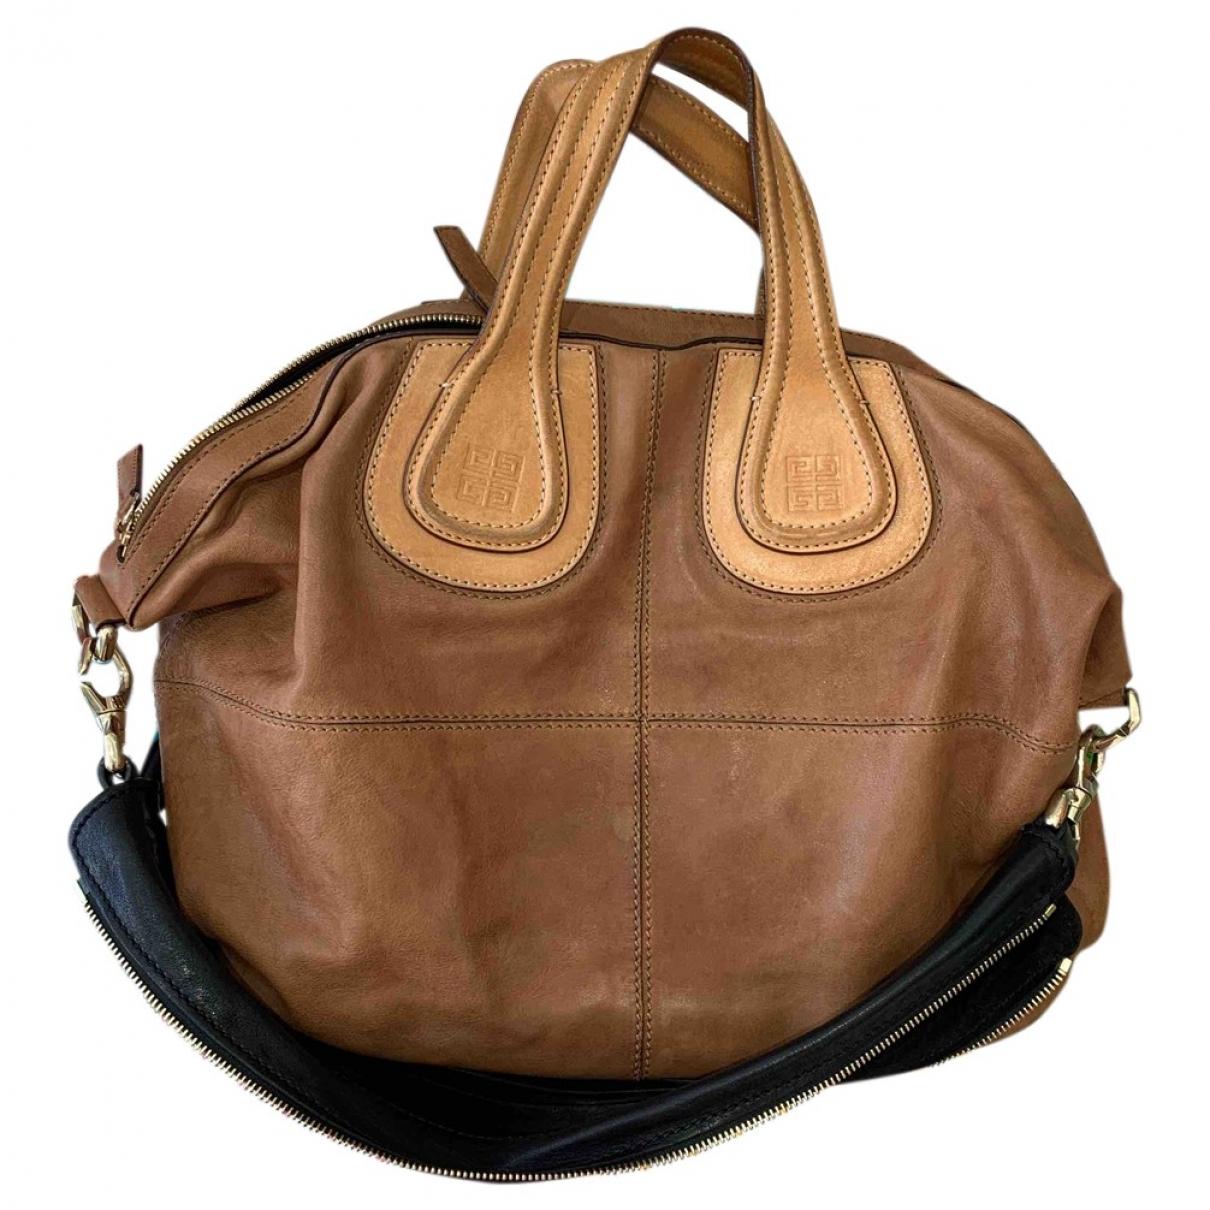 Givenchy Nightingale Camel Leather handbag for Women \N